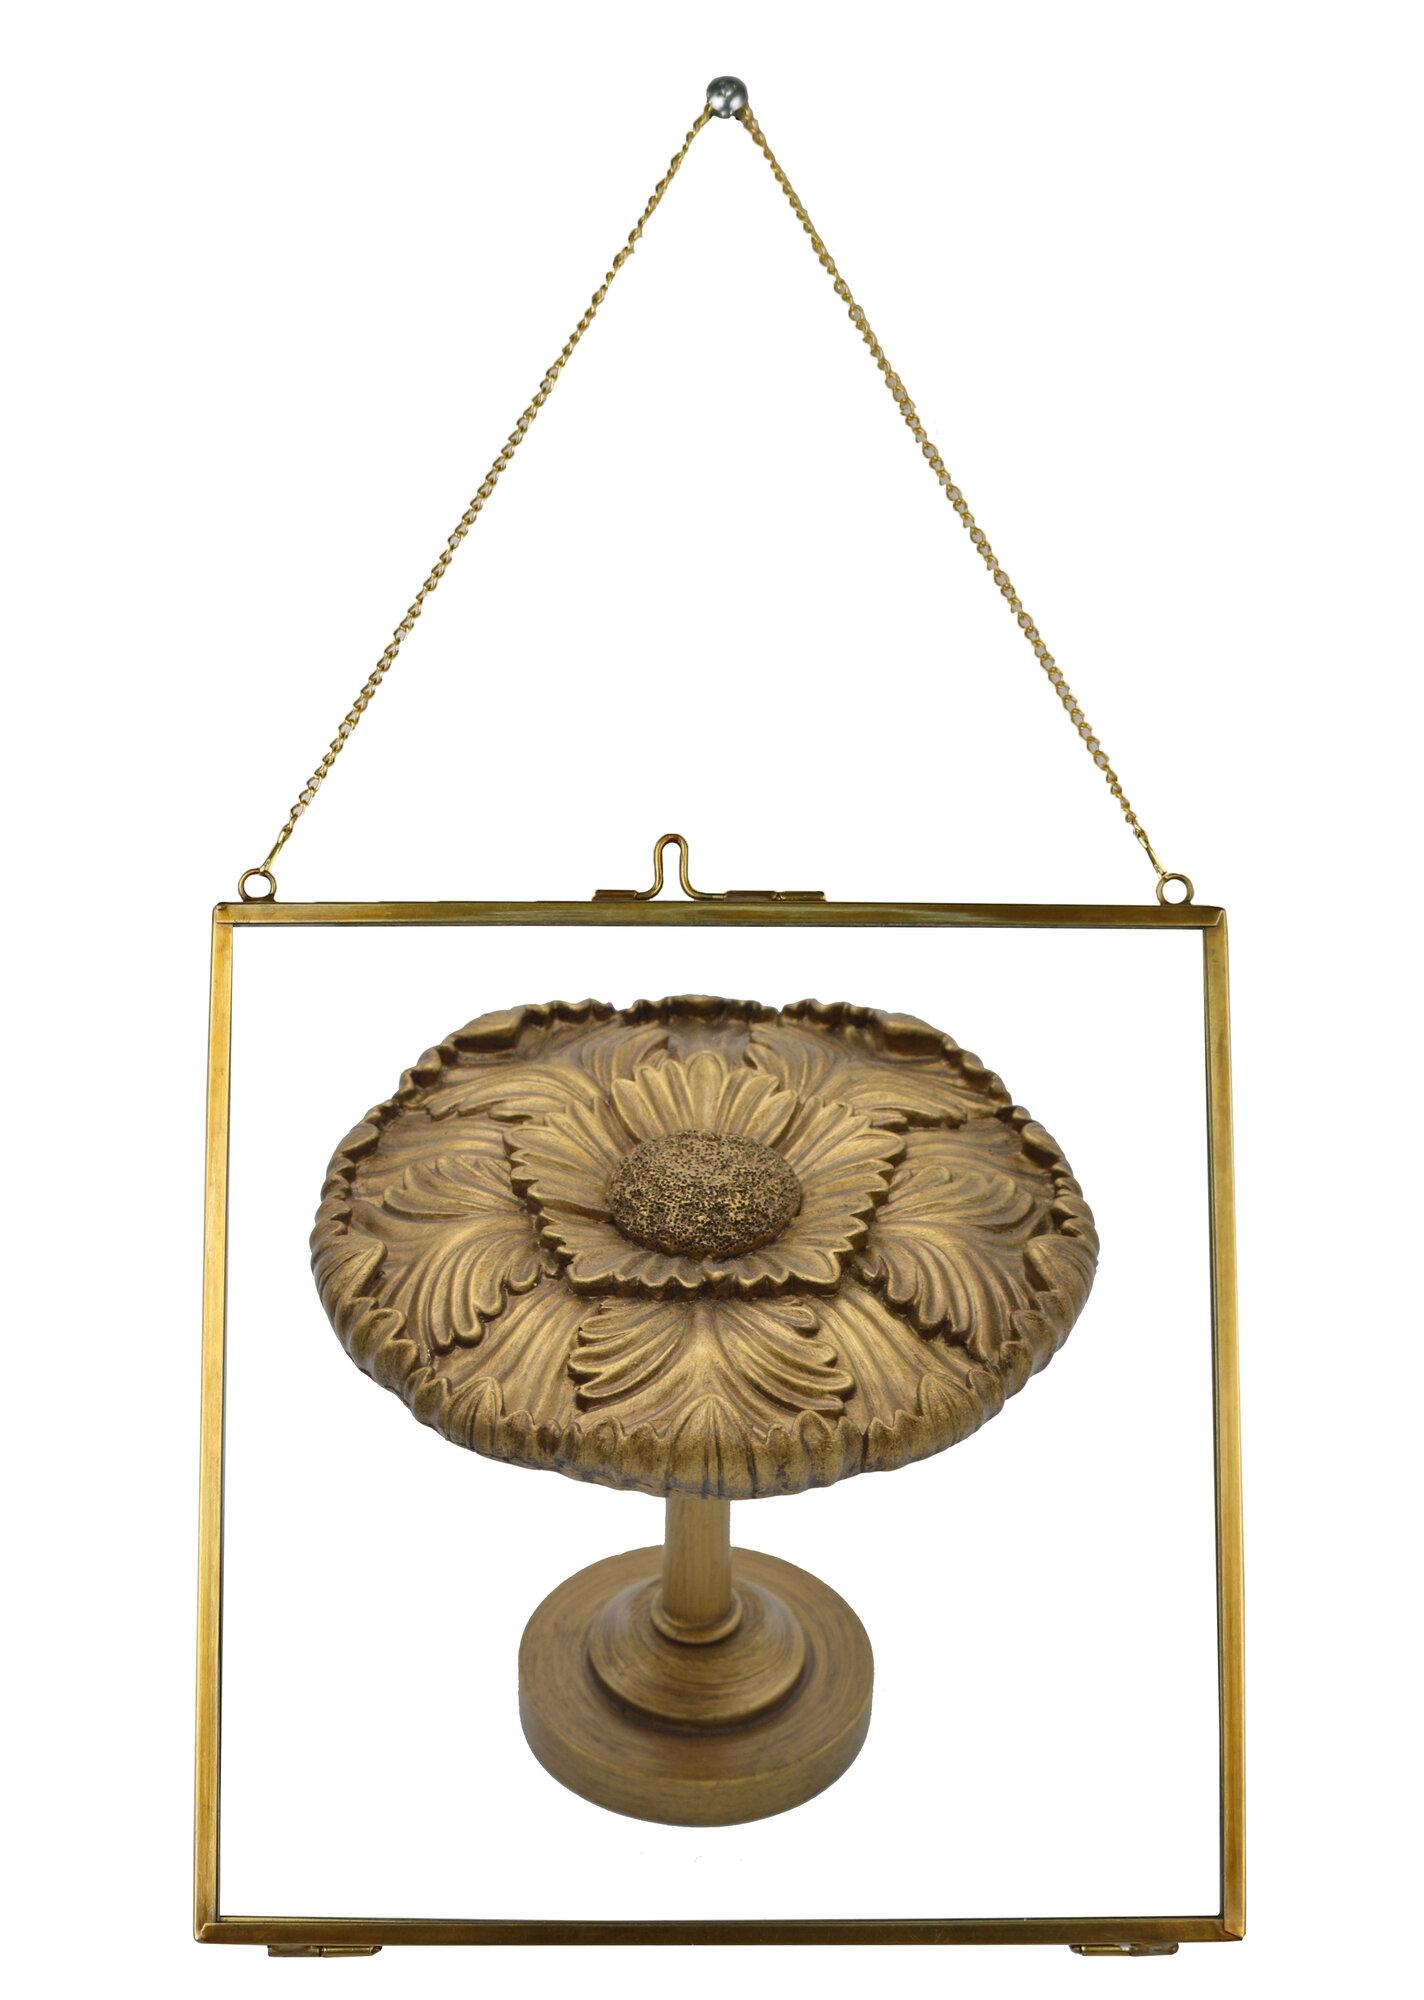 urbanest brixton brass and glass hanging picture frame ebay. Black Bedroom Furniture Sets. Home Design Ideas